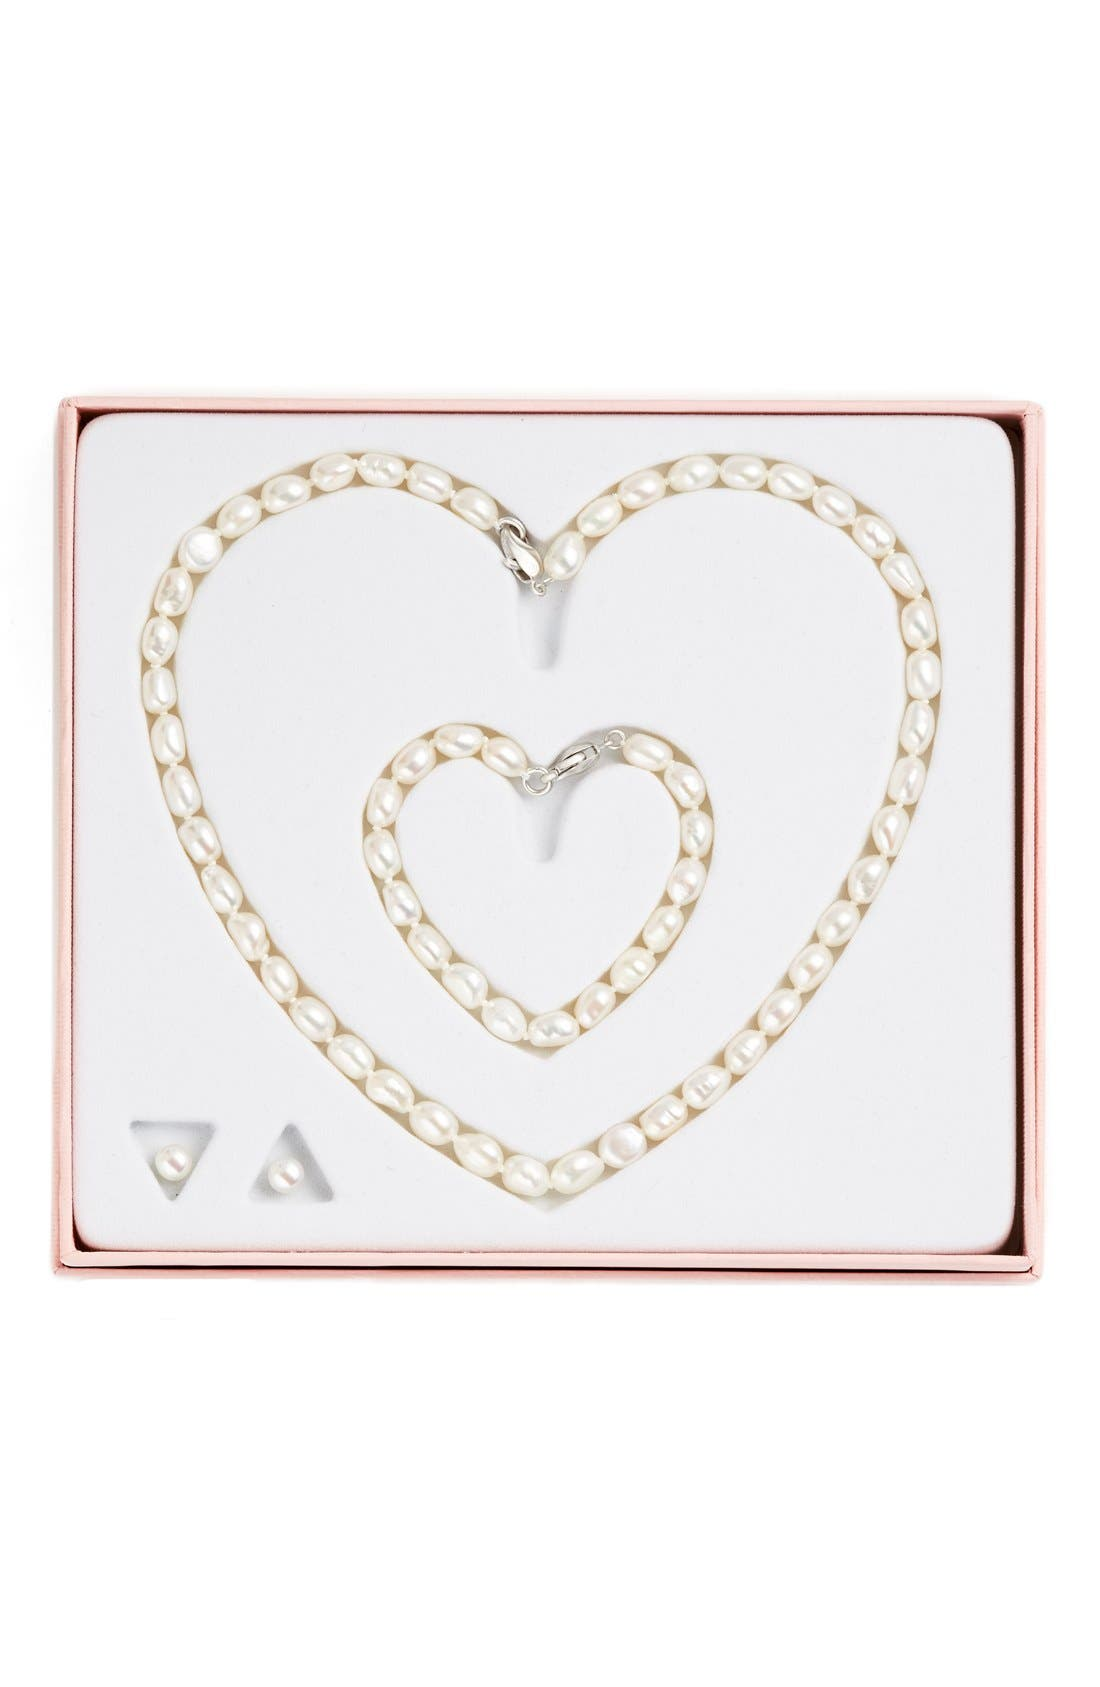 Freshwater Pearl Necklace, Bracelet & Earrings,                             Alternate thumbnail 2, color,